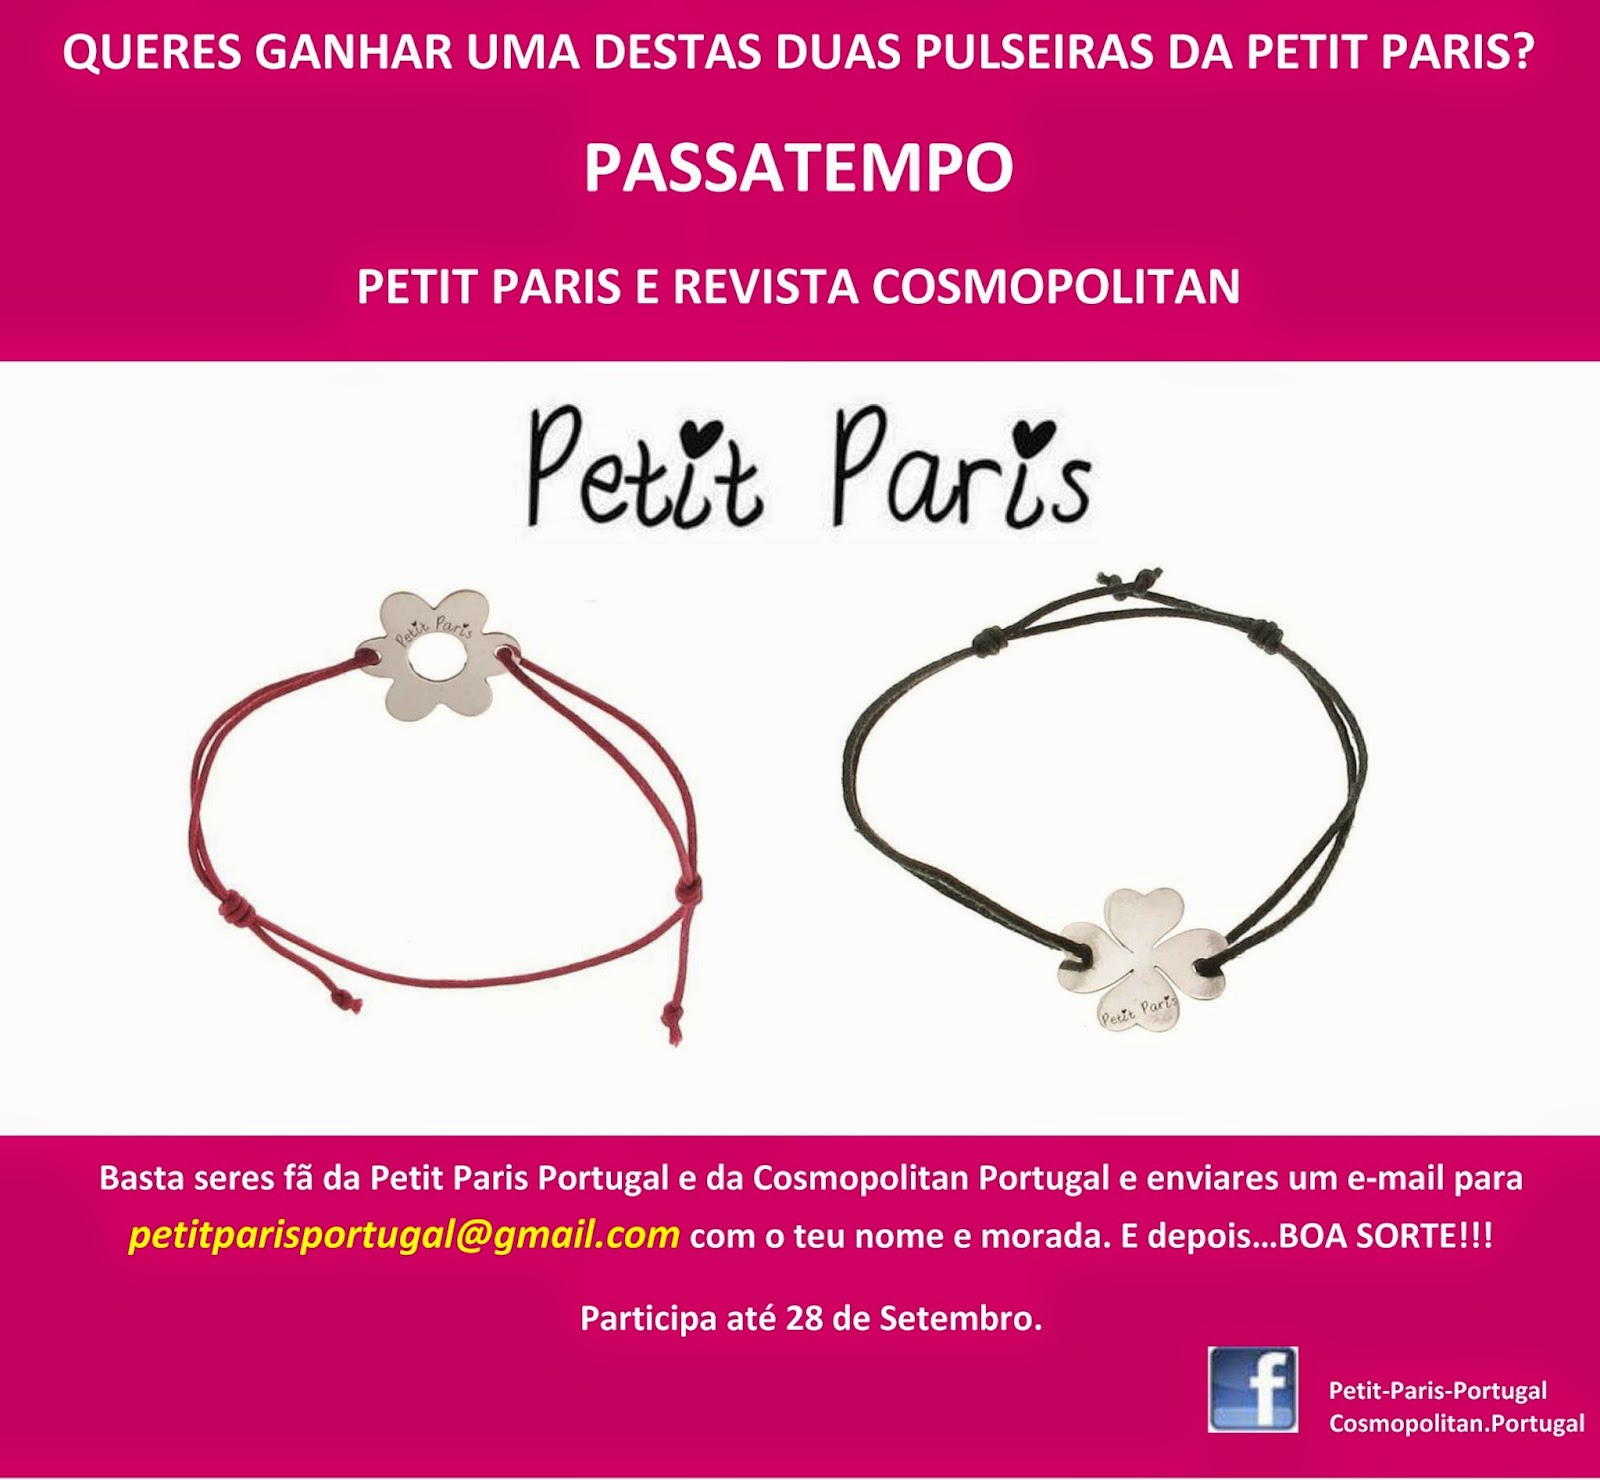 https://www.facebook.com/Cosmopolitan.Portugal/photos/a.189516647728908.52682.186709008009672/985046221509276/?type=1&theater